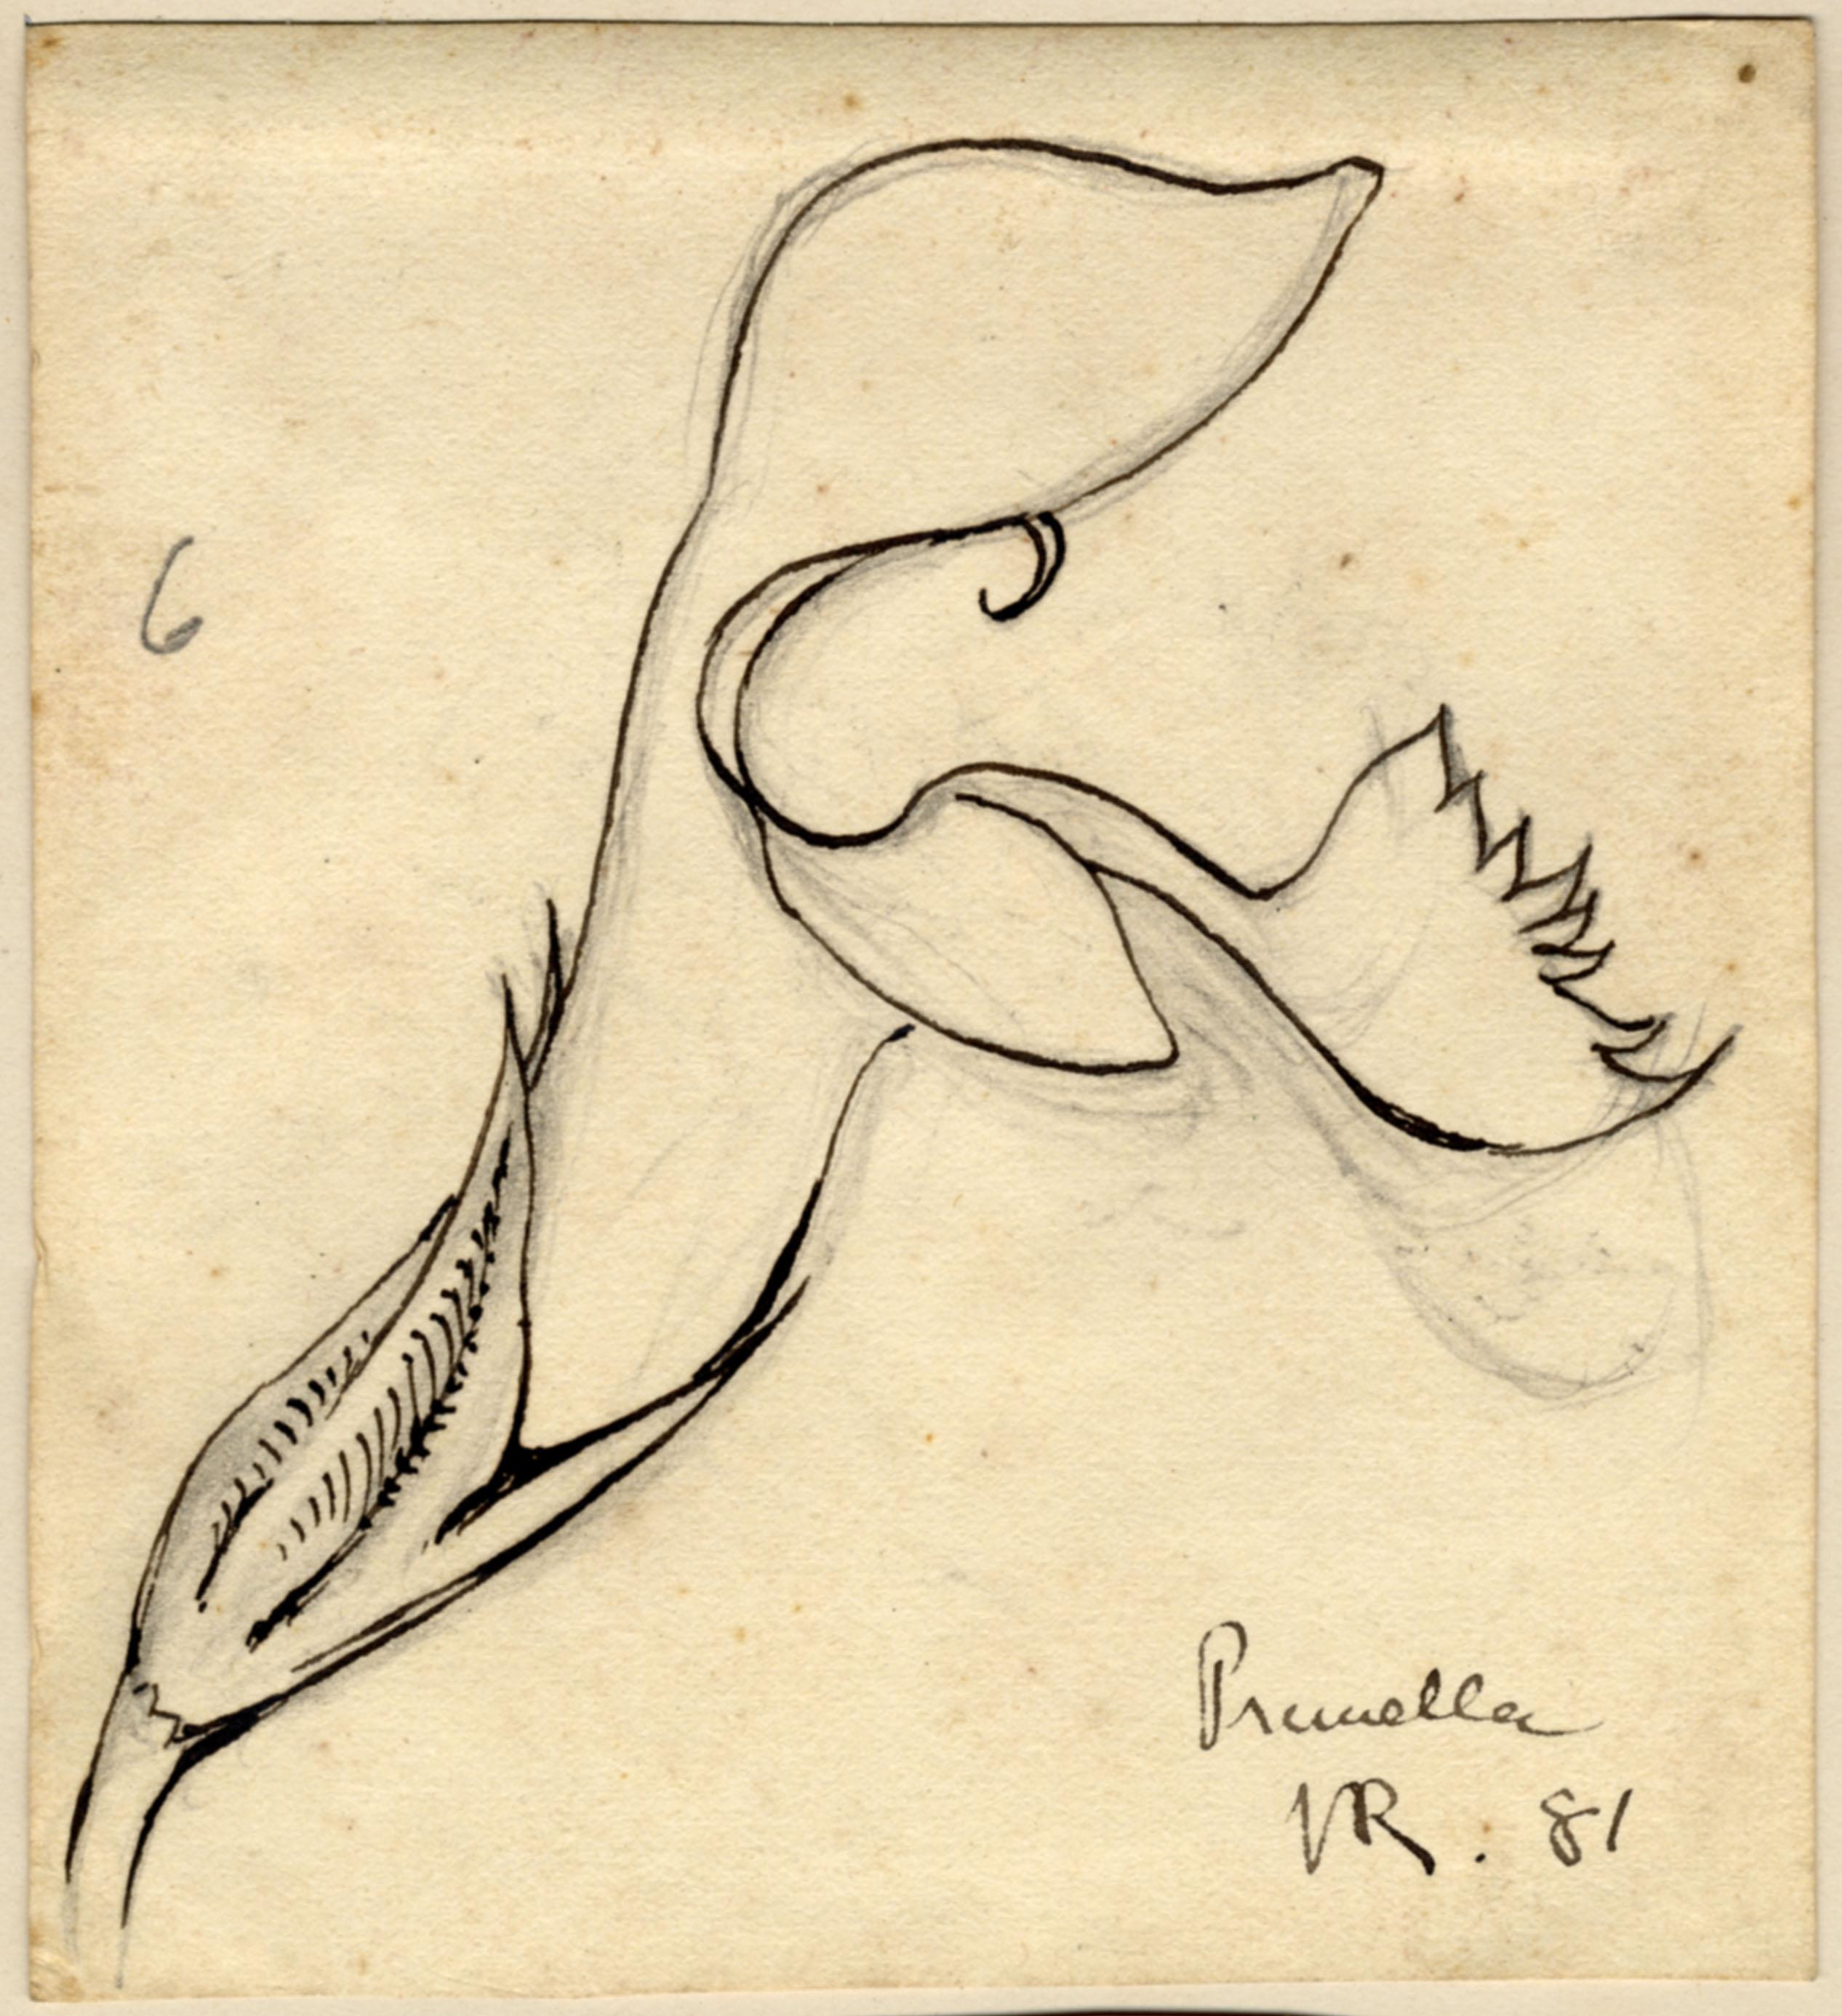 John Ruskin, Prunella, 1881, RF1181, © Ruskin Foundation